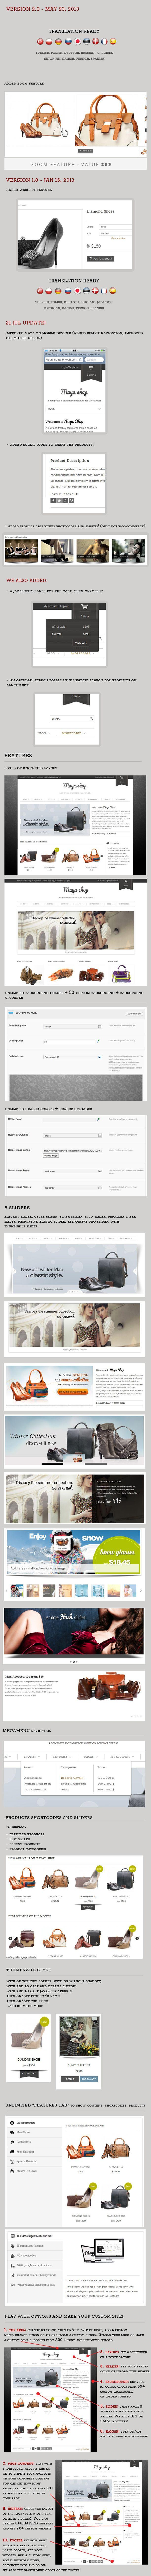 WordPress - MayaShop - A Flexible Responsive e-Commerce Theme | ThemeForest Great #woocommerce #theme